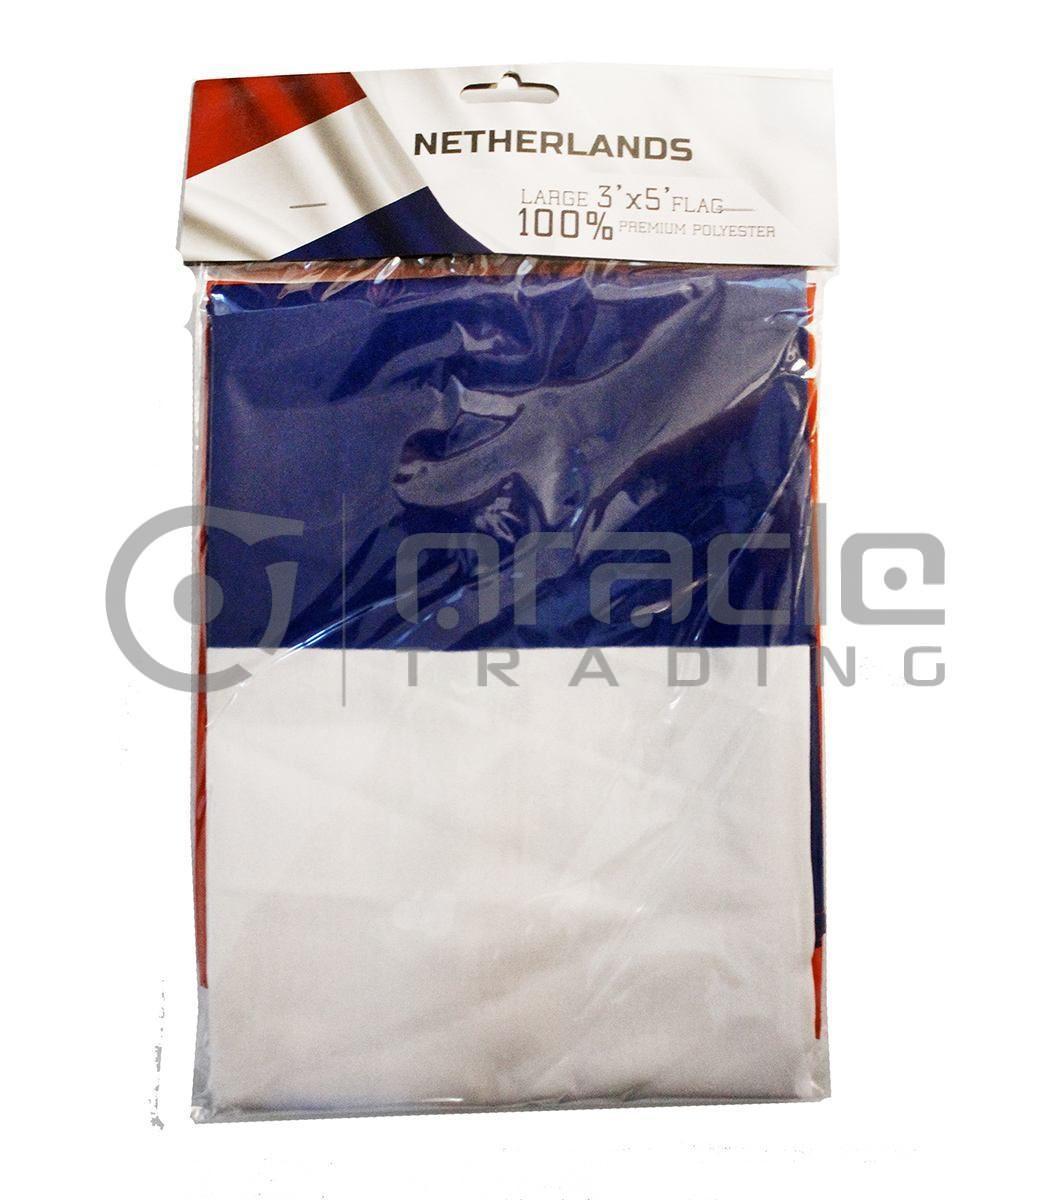 Large 3'x5' Netherlands Flag (Holland)